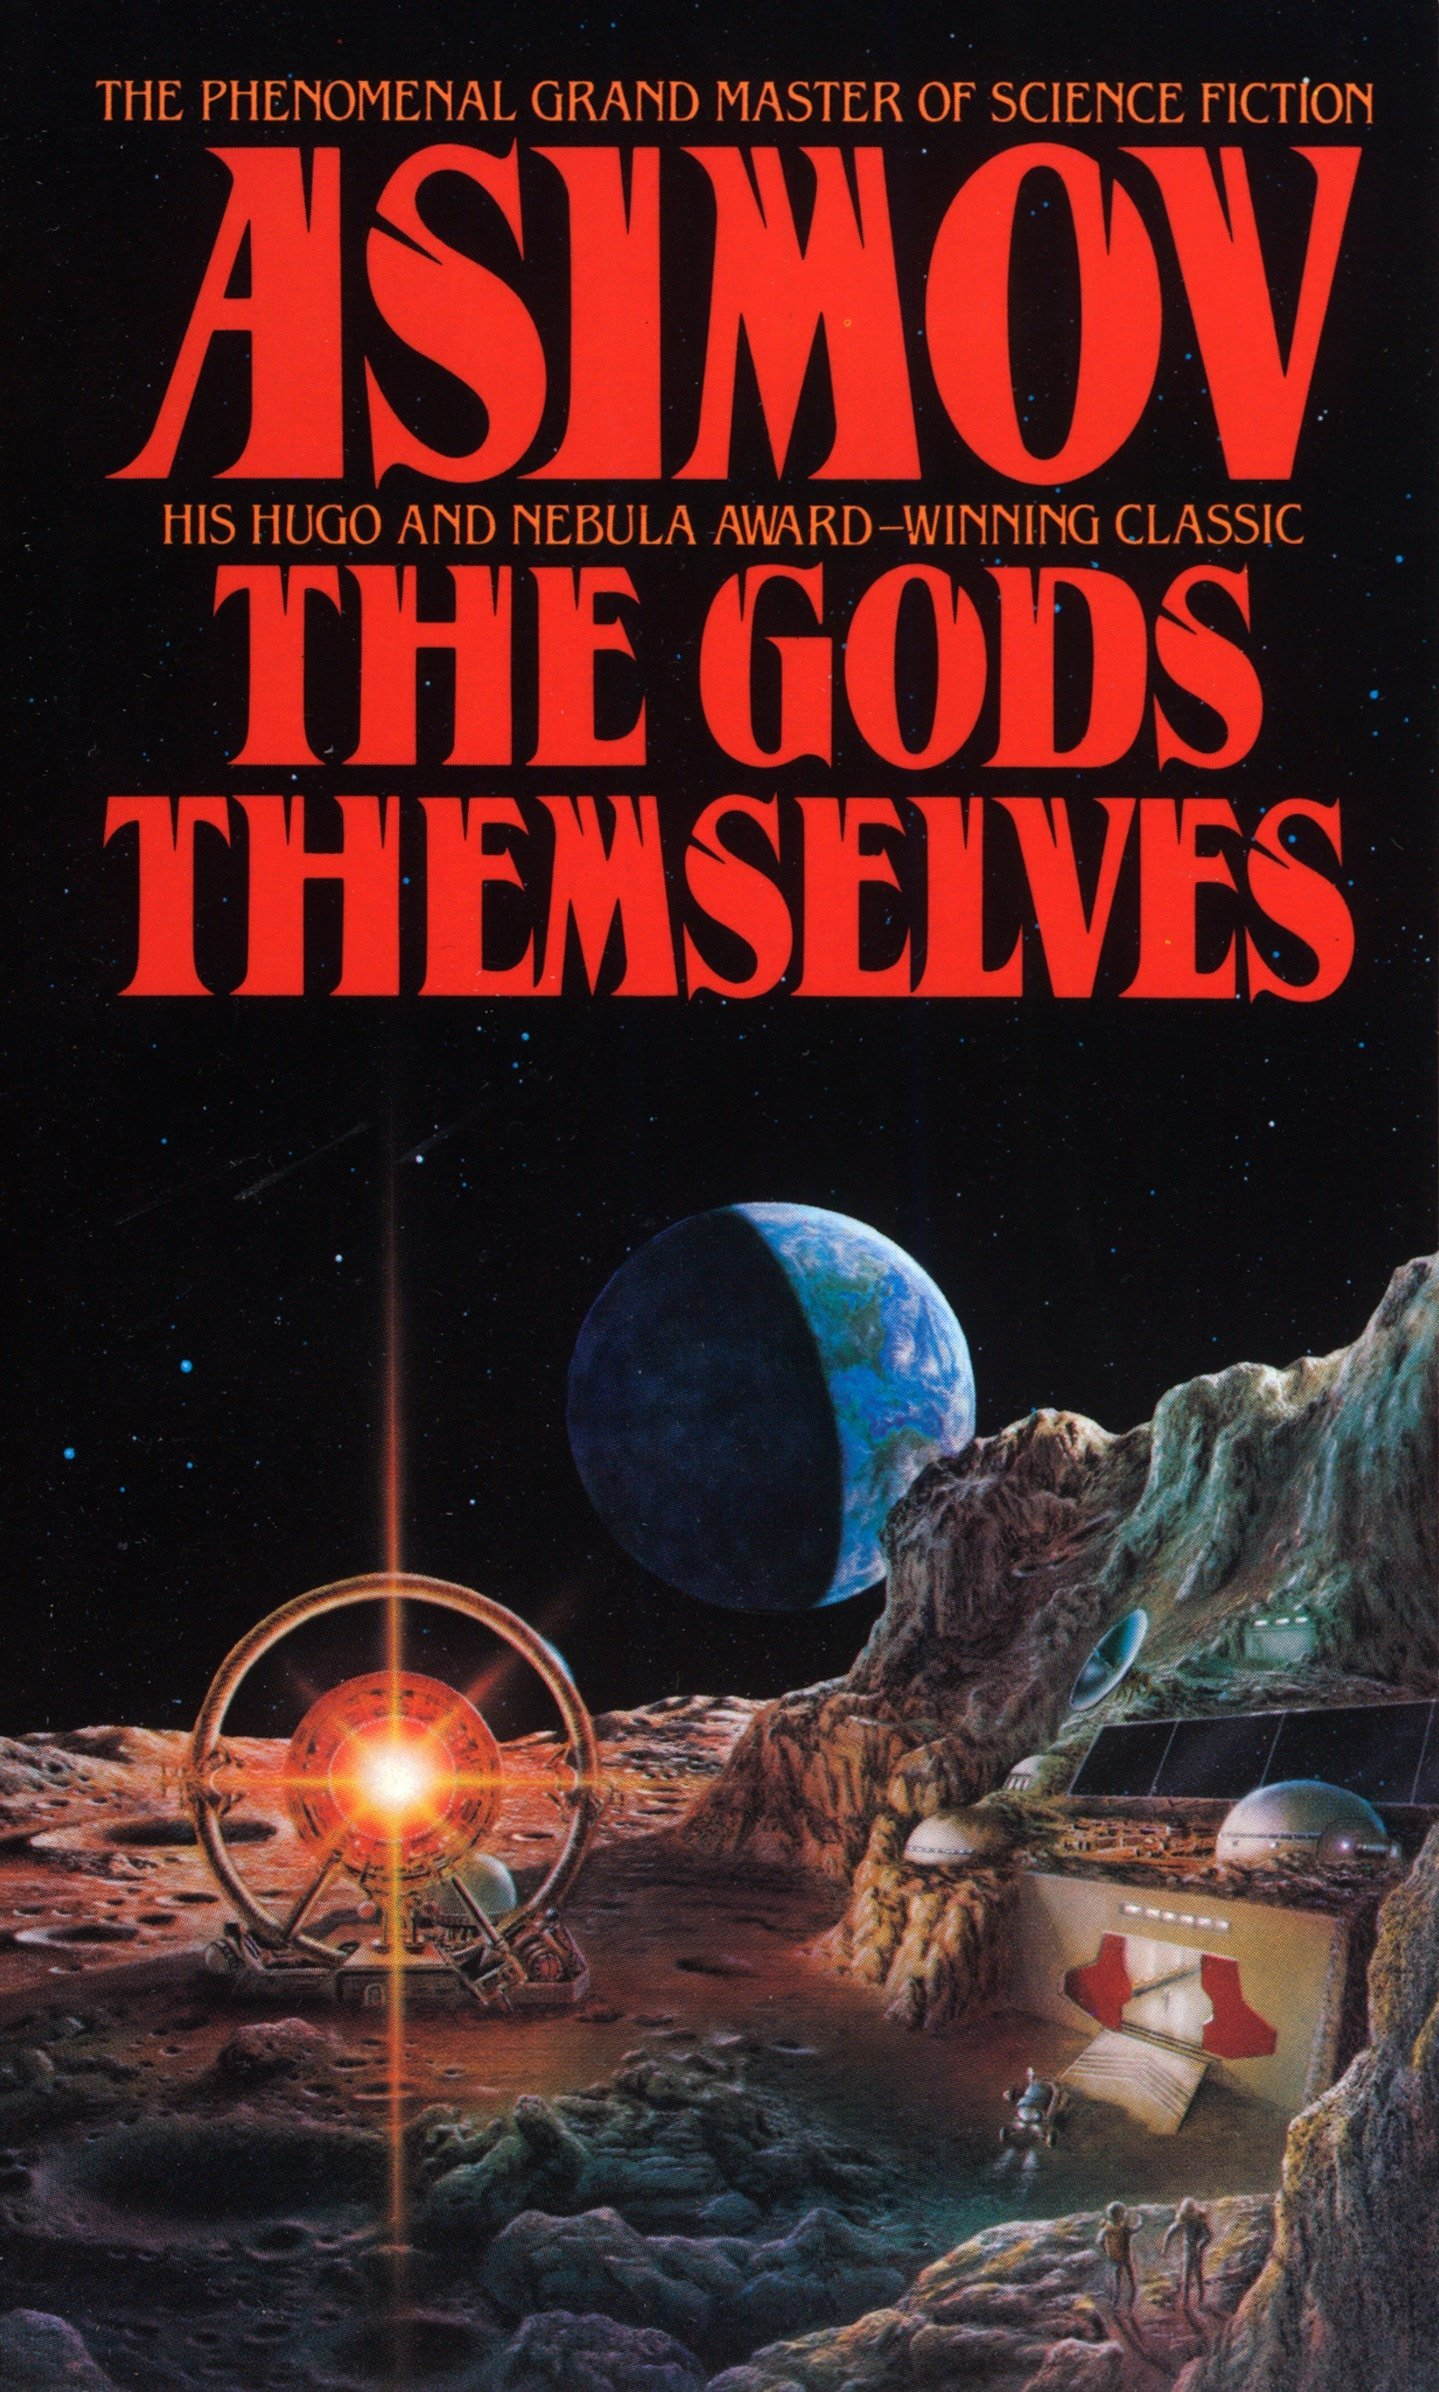 The Gods Themselves: A Novel (Nemesis Bantam Spectra Book)